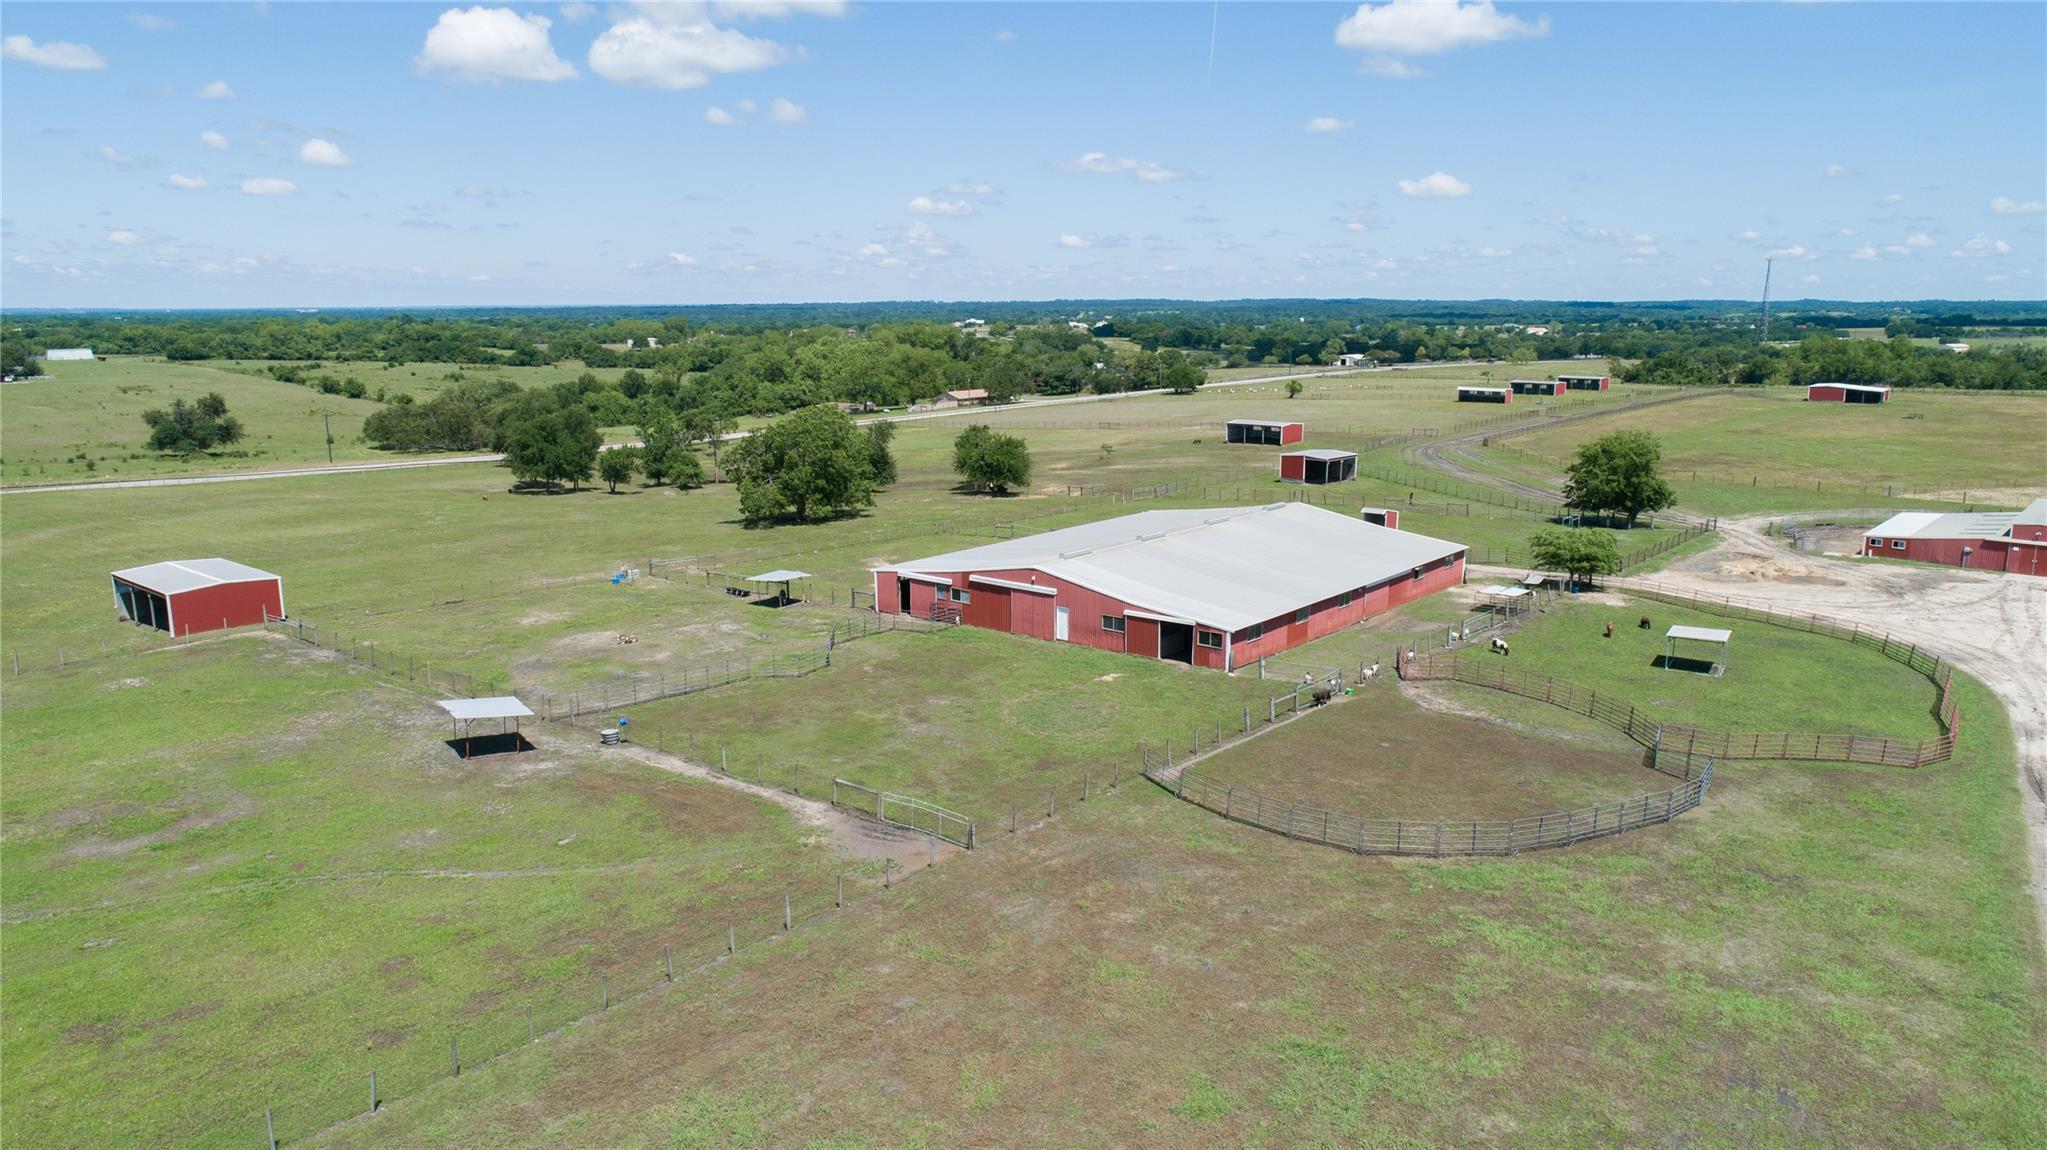 12409 FM 362 - 21 Acres Property Photo - Navasota, TX real estate listing